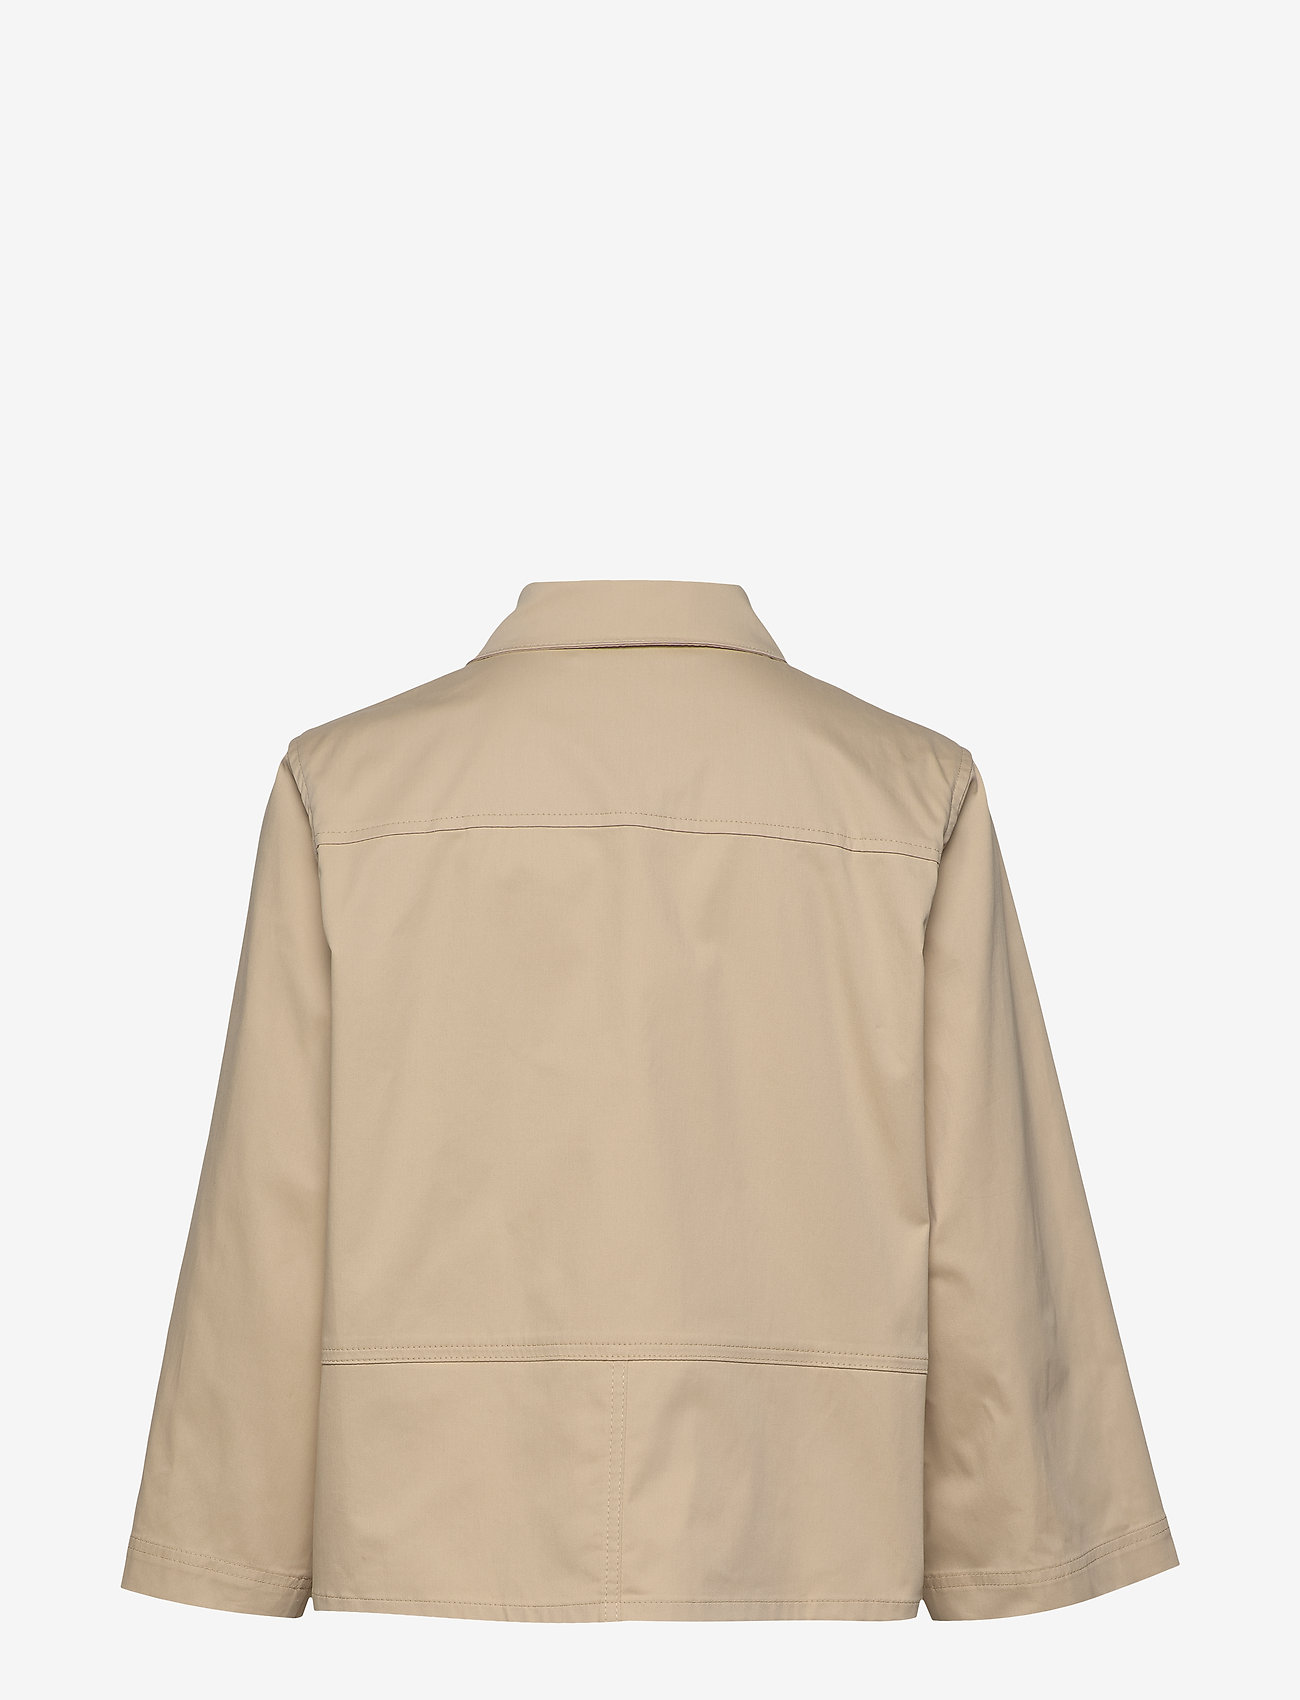 Särskild rabattPhoenix Cole Jacket Safari 1274.25 MOS MOSH kBSBe 7Ajjo